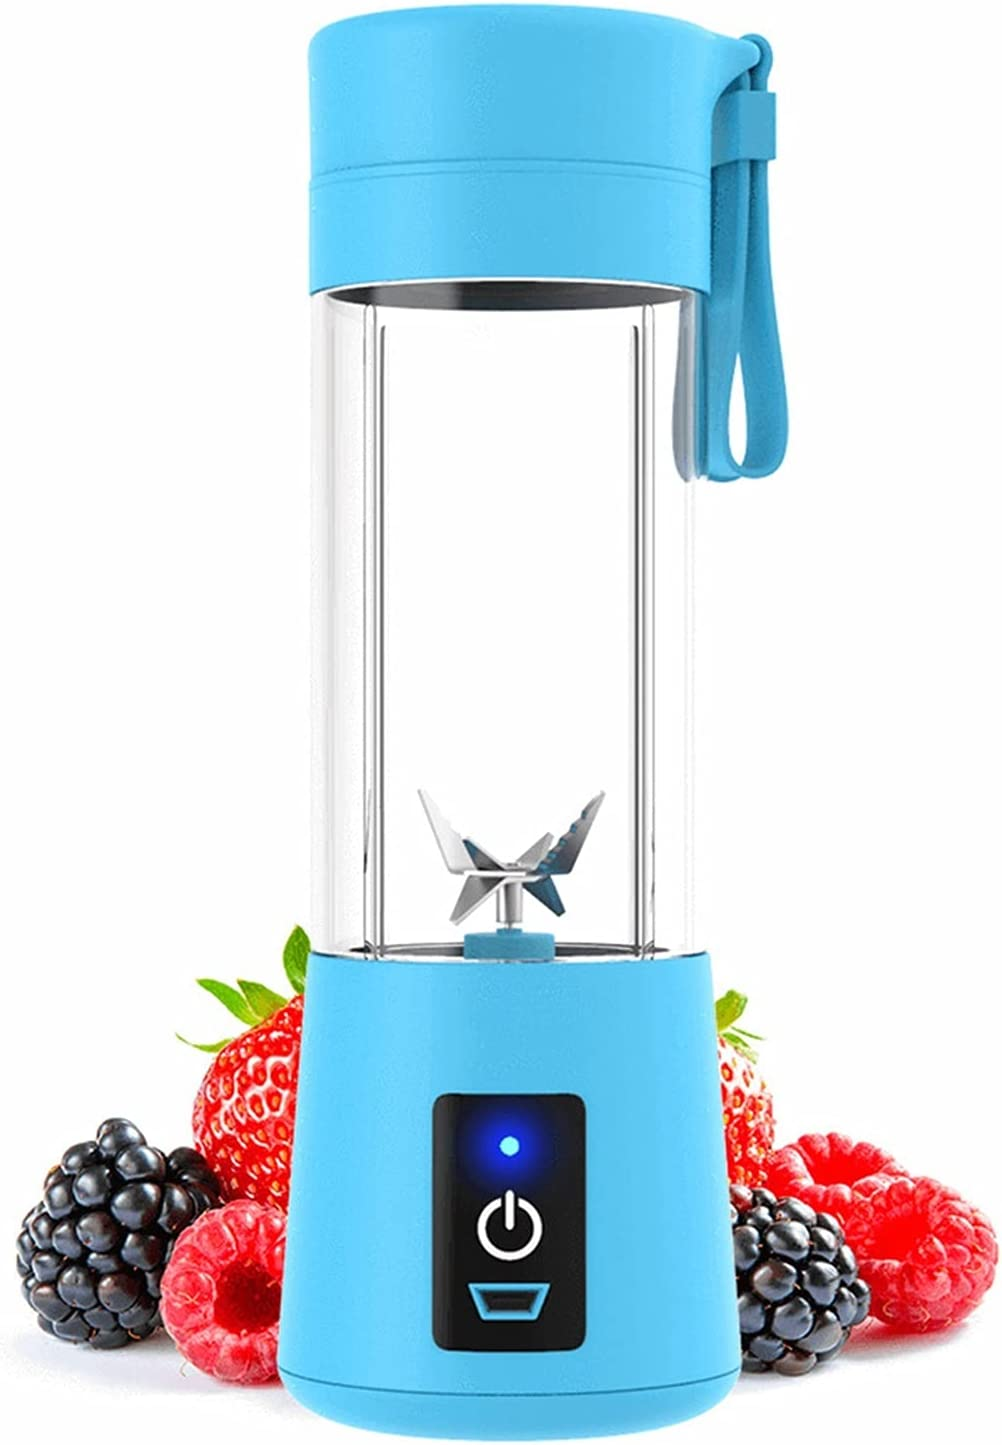 380ml 6 Blades Portable Blender Household 2021 spring and Japan Maker New summer new Juicer Electric Fruit